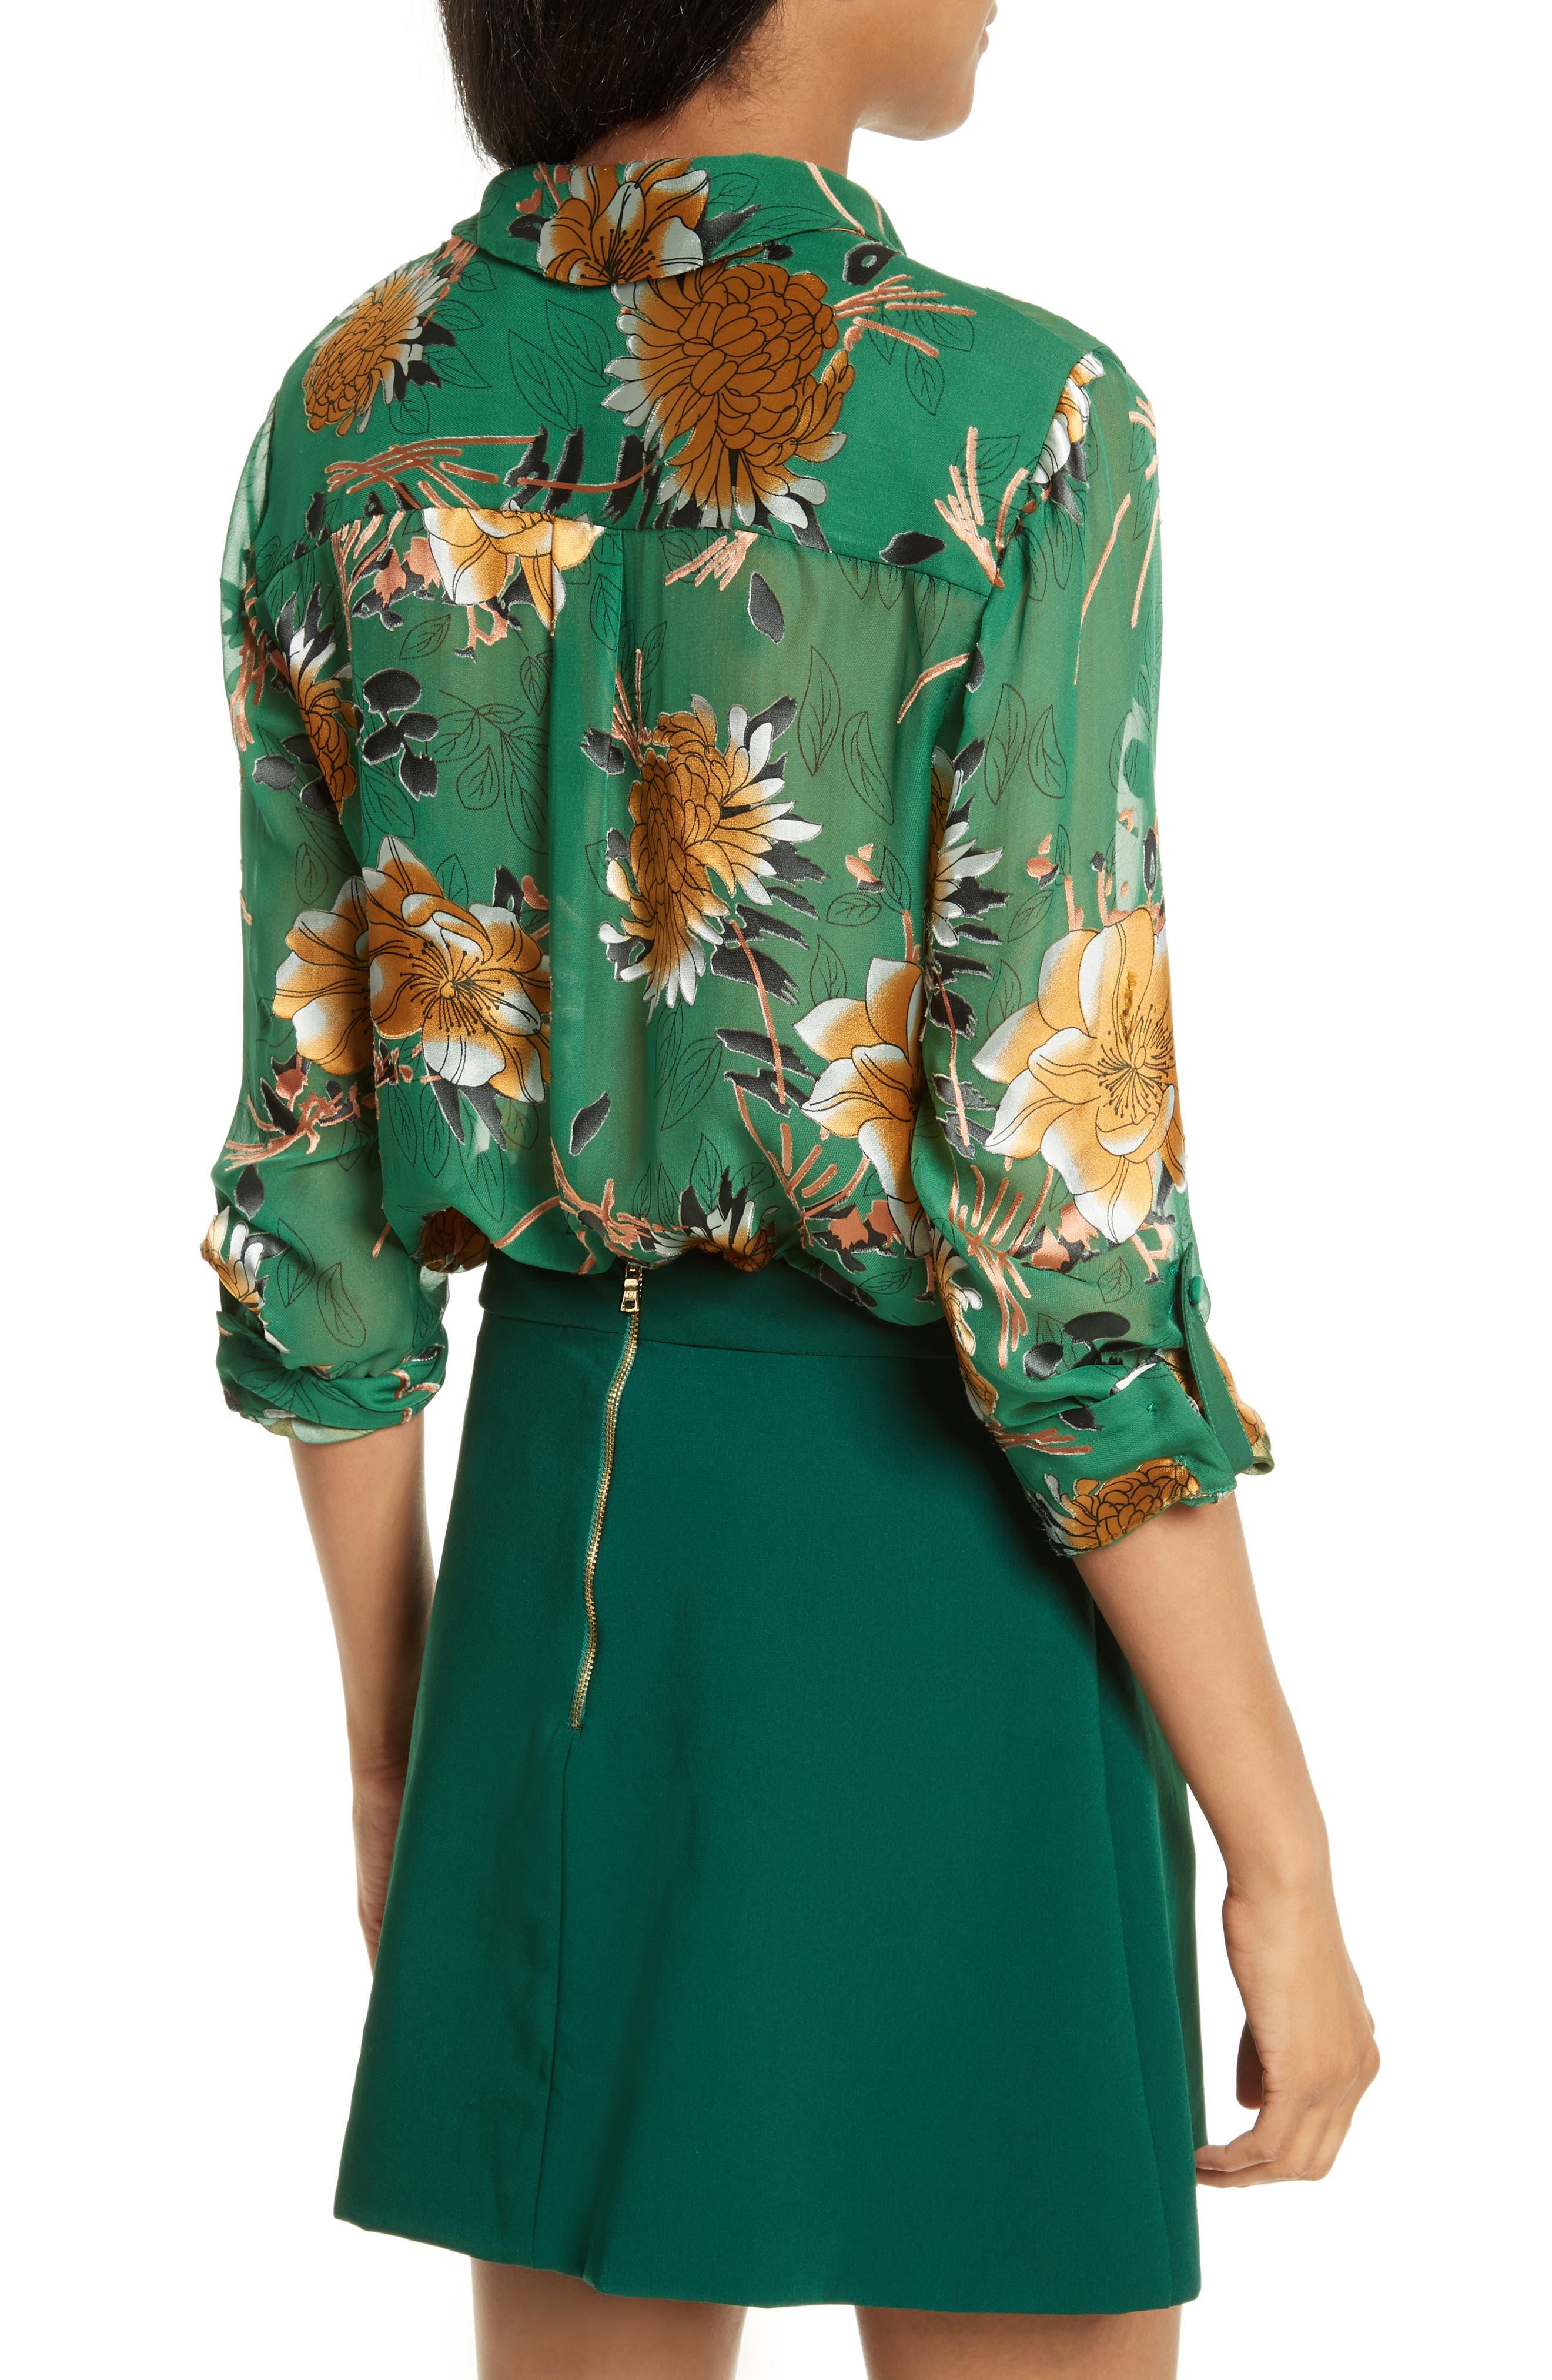 Eloise Roll Sleeve Floral Blouse,                             Alternate thumbnail 2, color,                             308